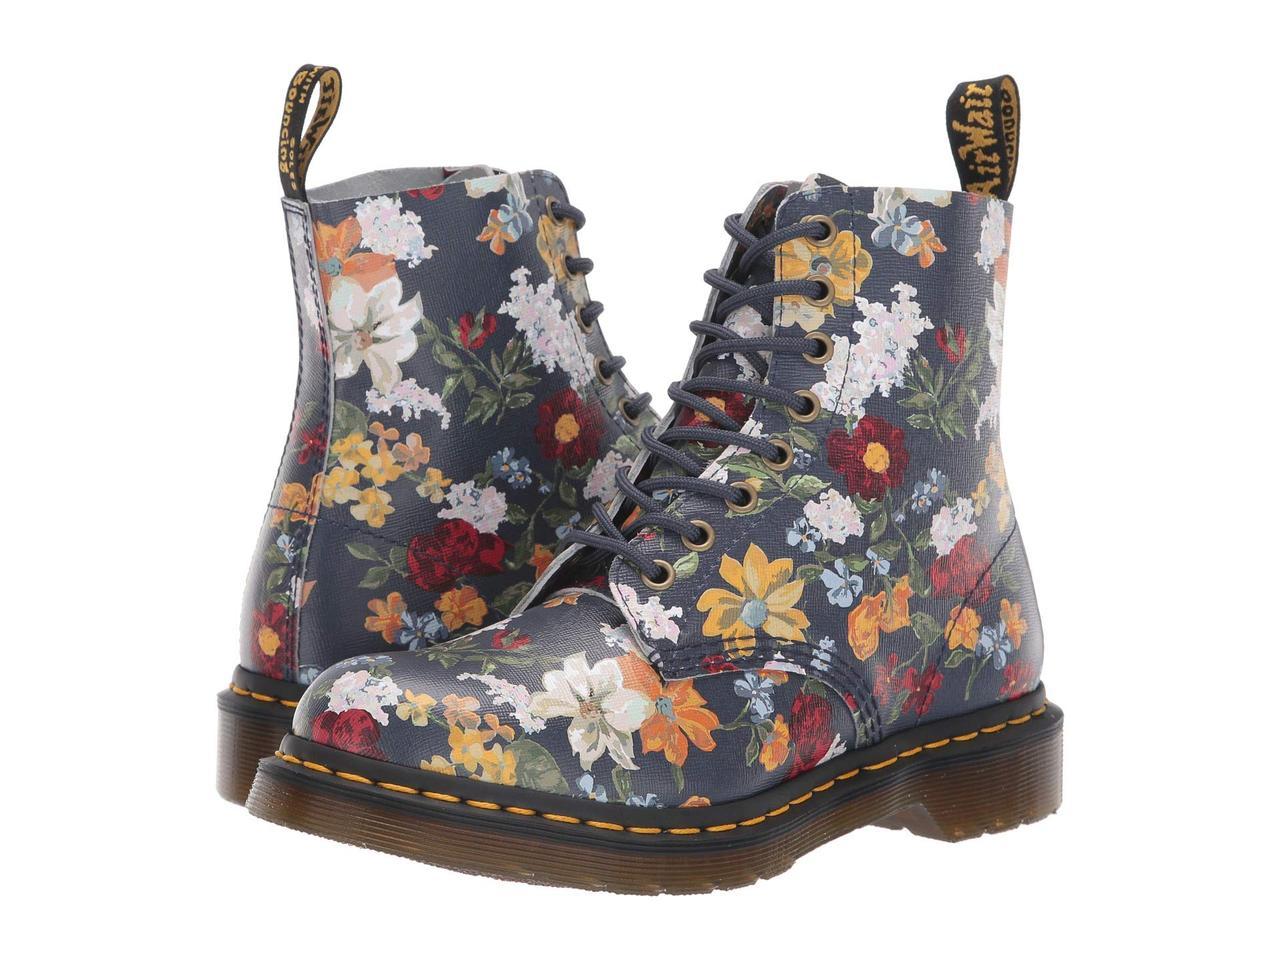 Ботинки Сапоги (Оригинал) Dr. Martens 1460 Pascal Darcy Floral DMS Navy  Darcy 62f538c3edd14